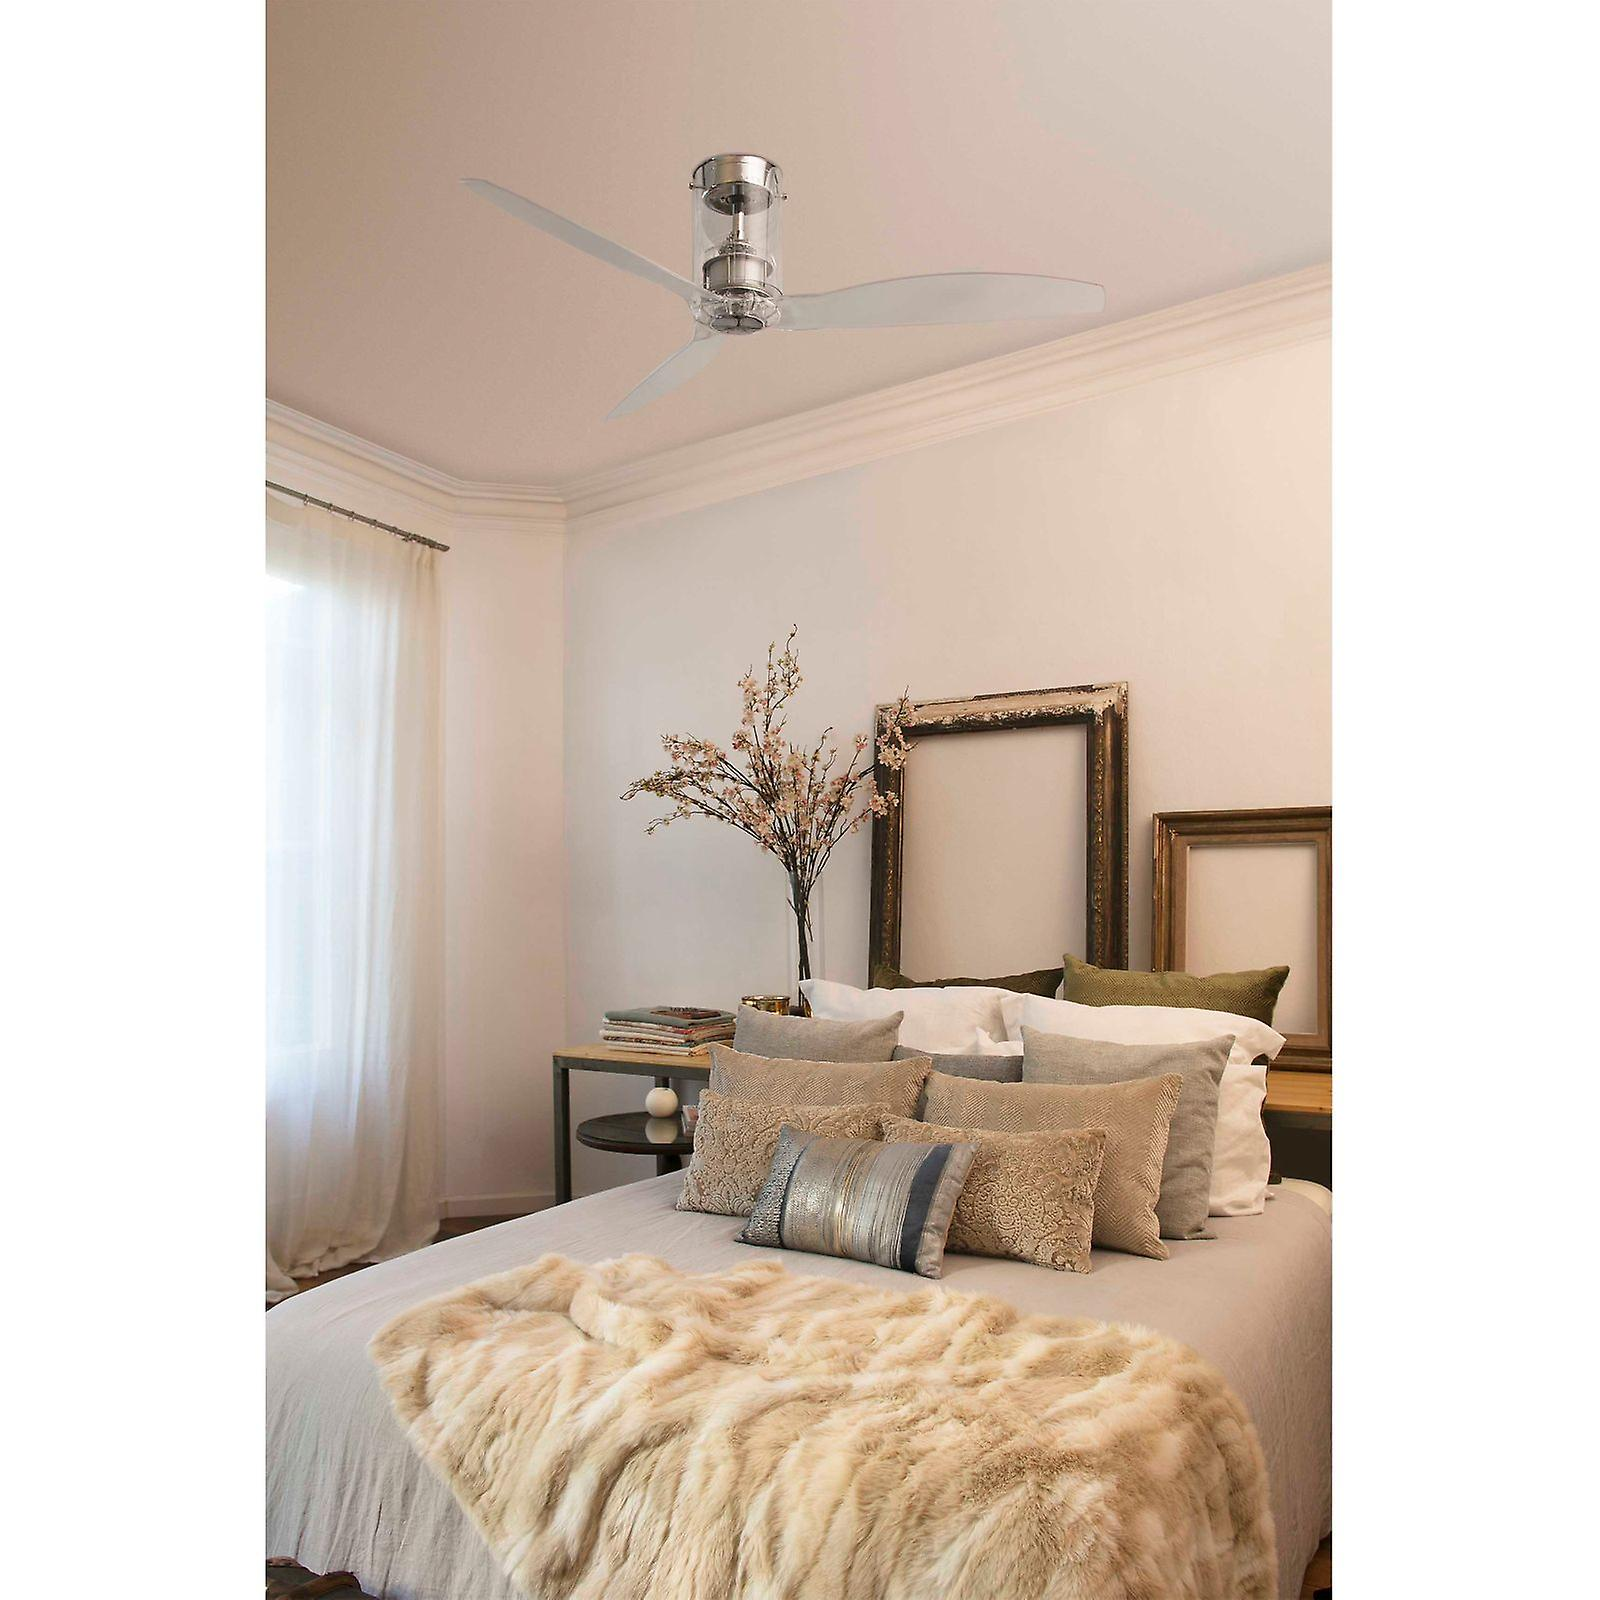 Energy-saving Ceiling Fan Mini Tube Chrome 128cm / 50